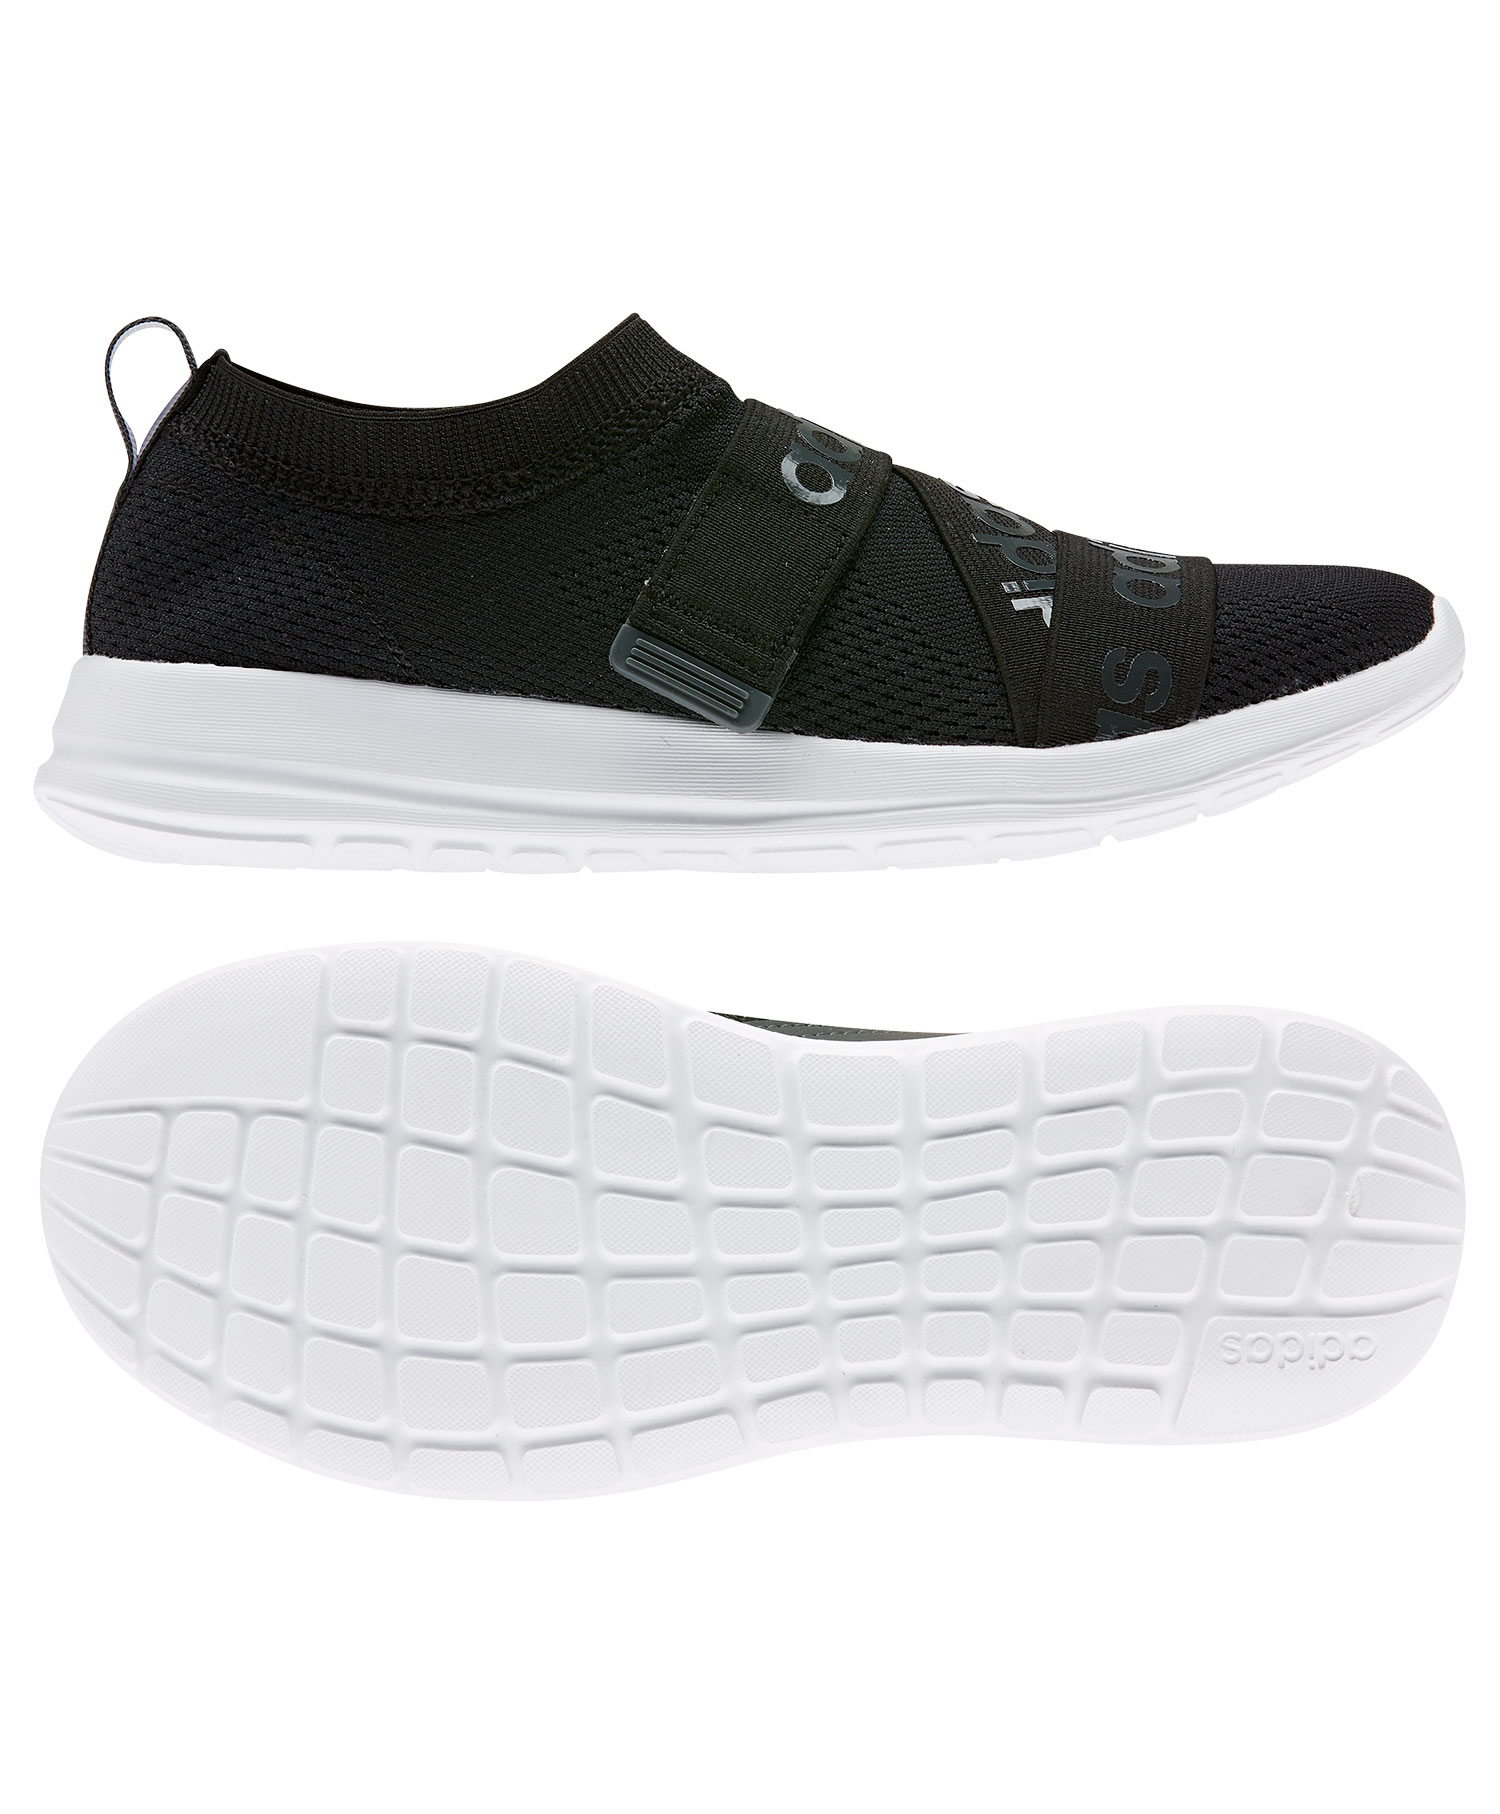 adidas Khoe adapt X